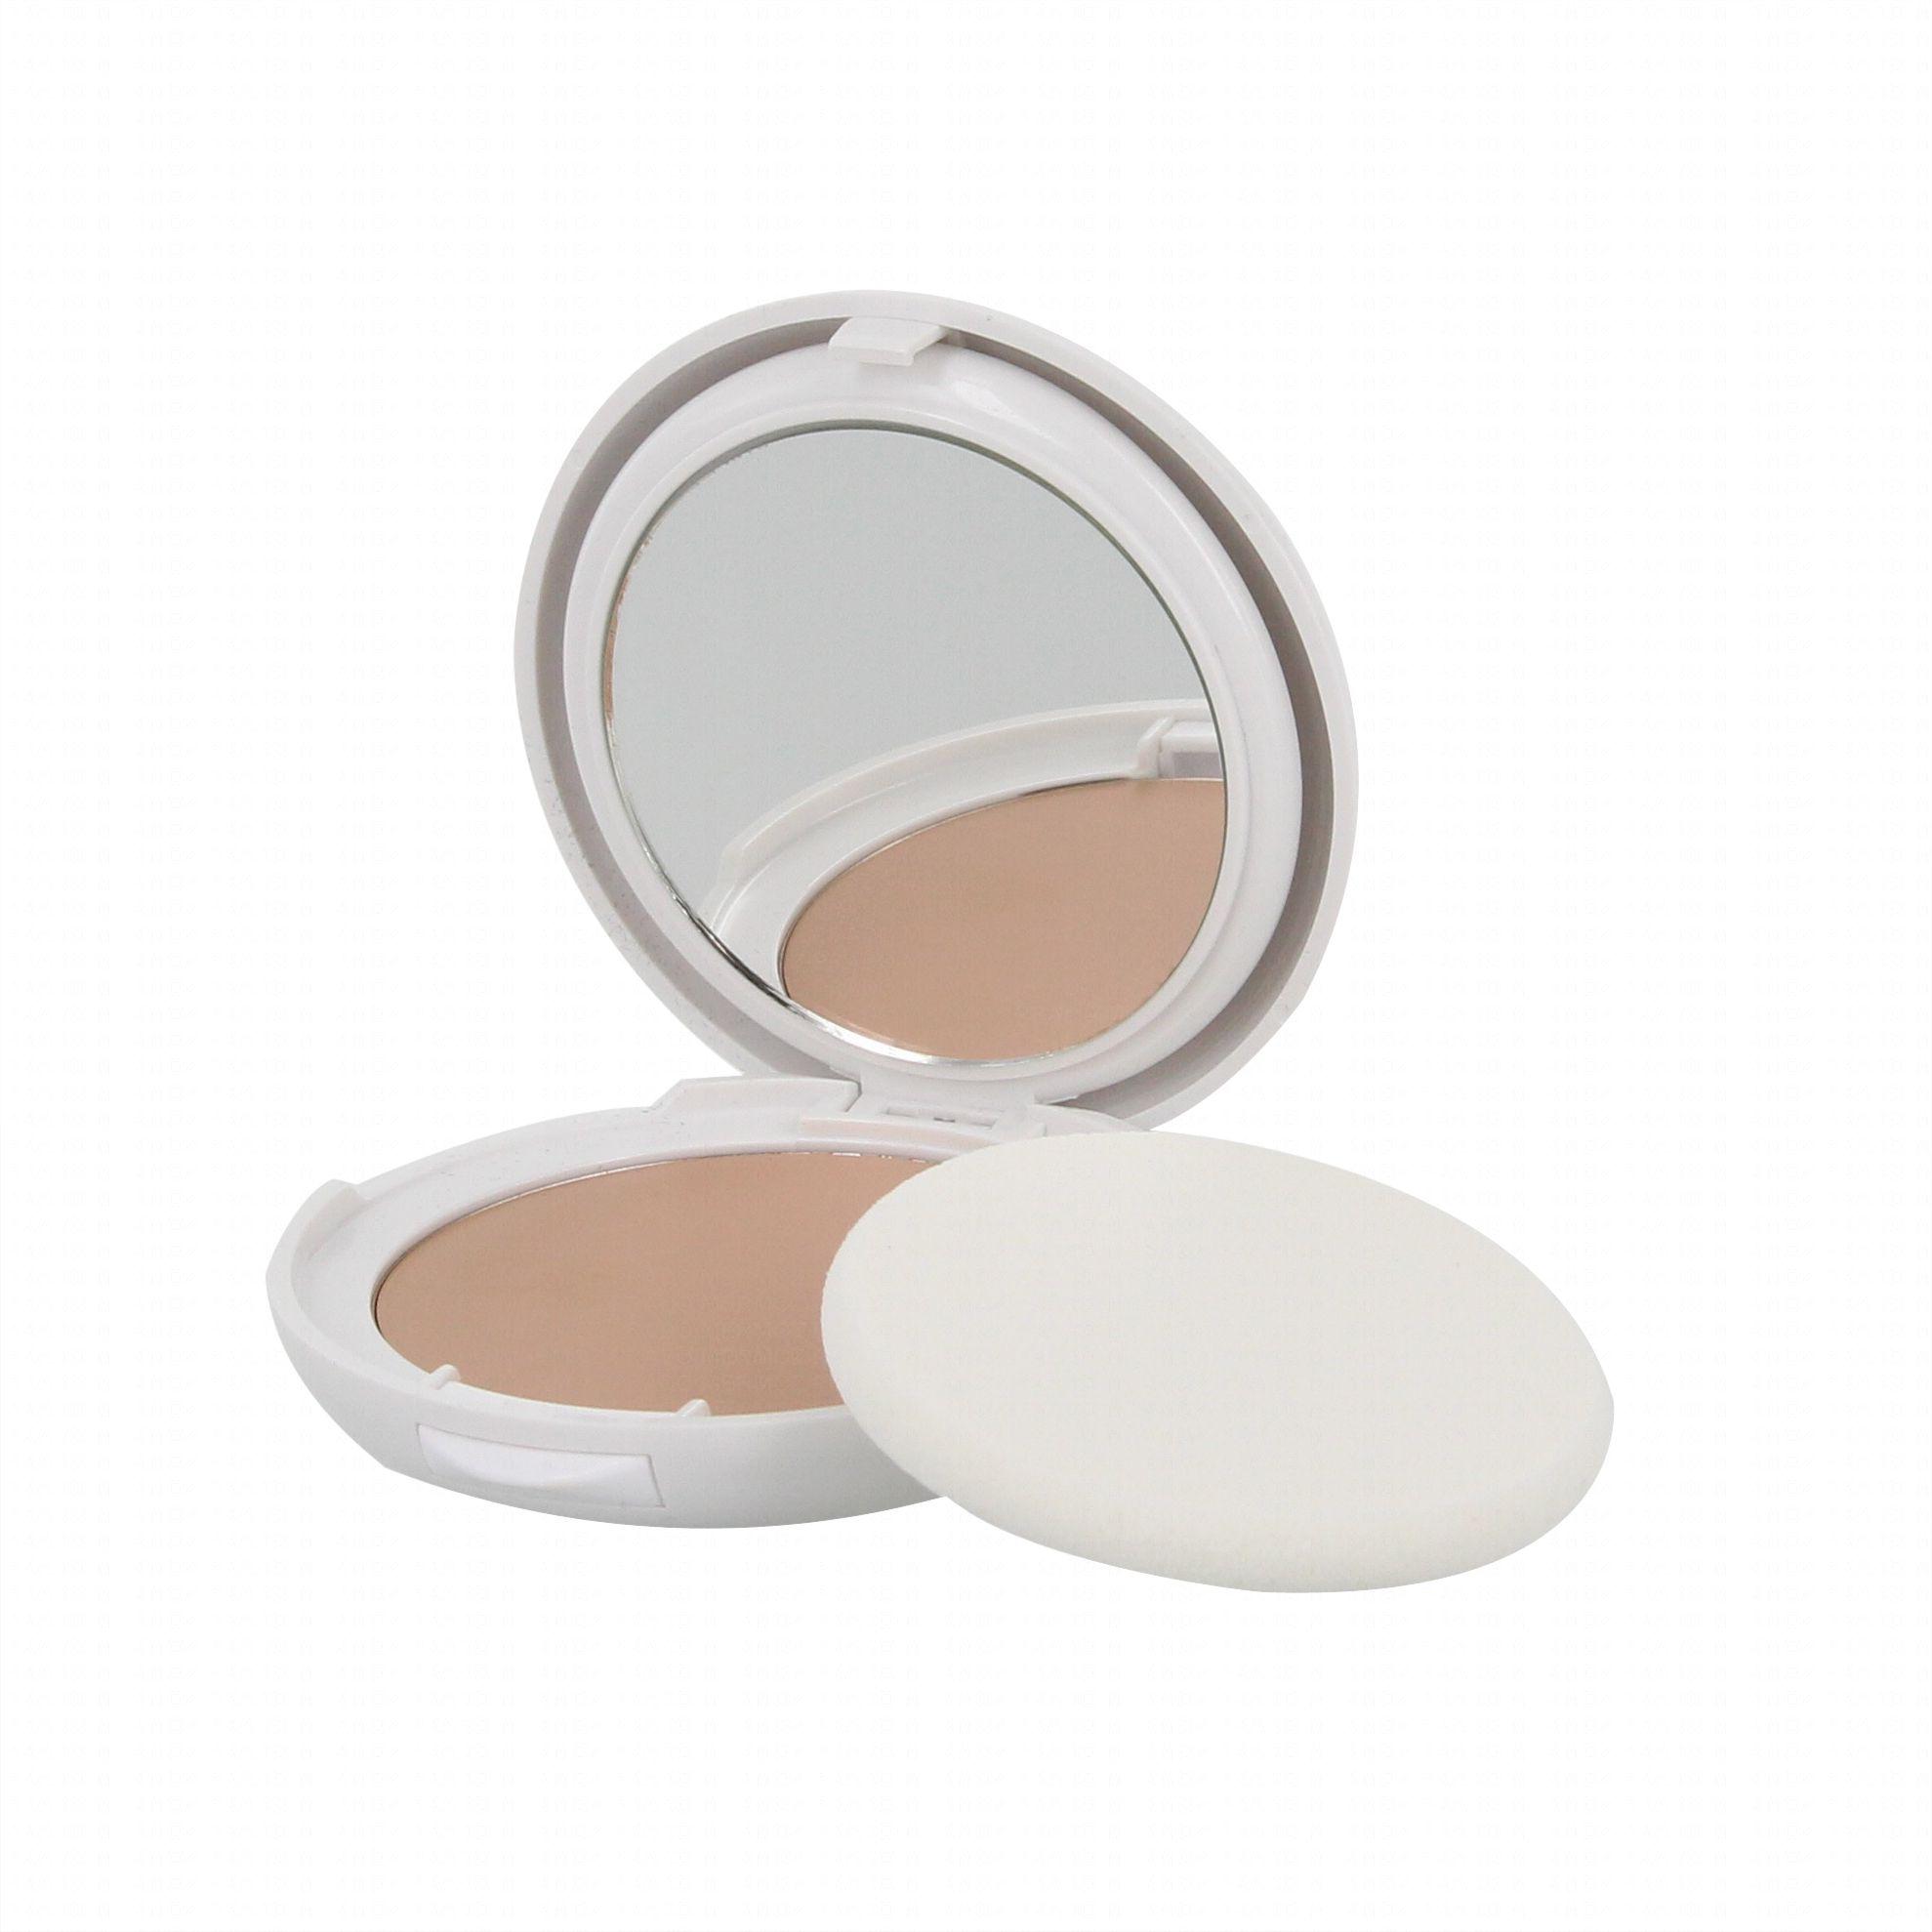 svr 50 compact beige sable